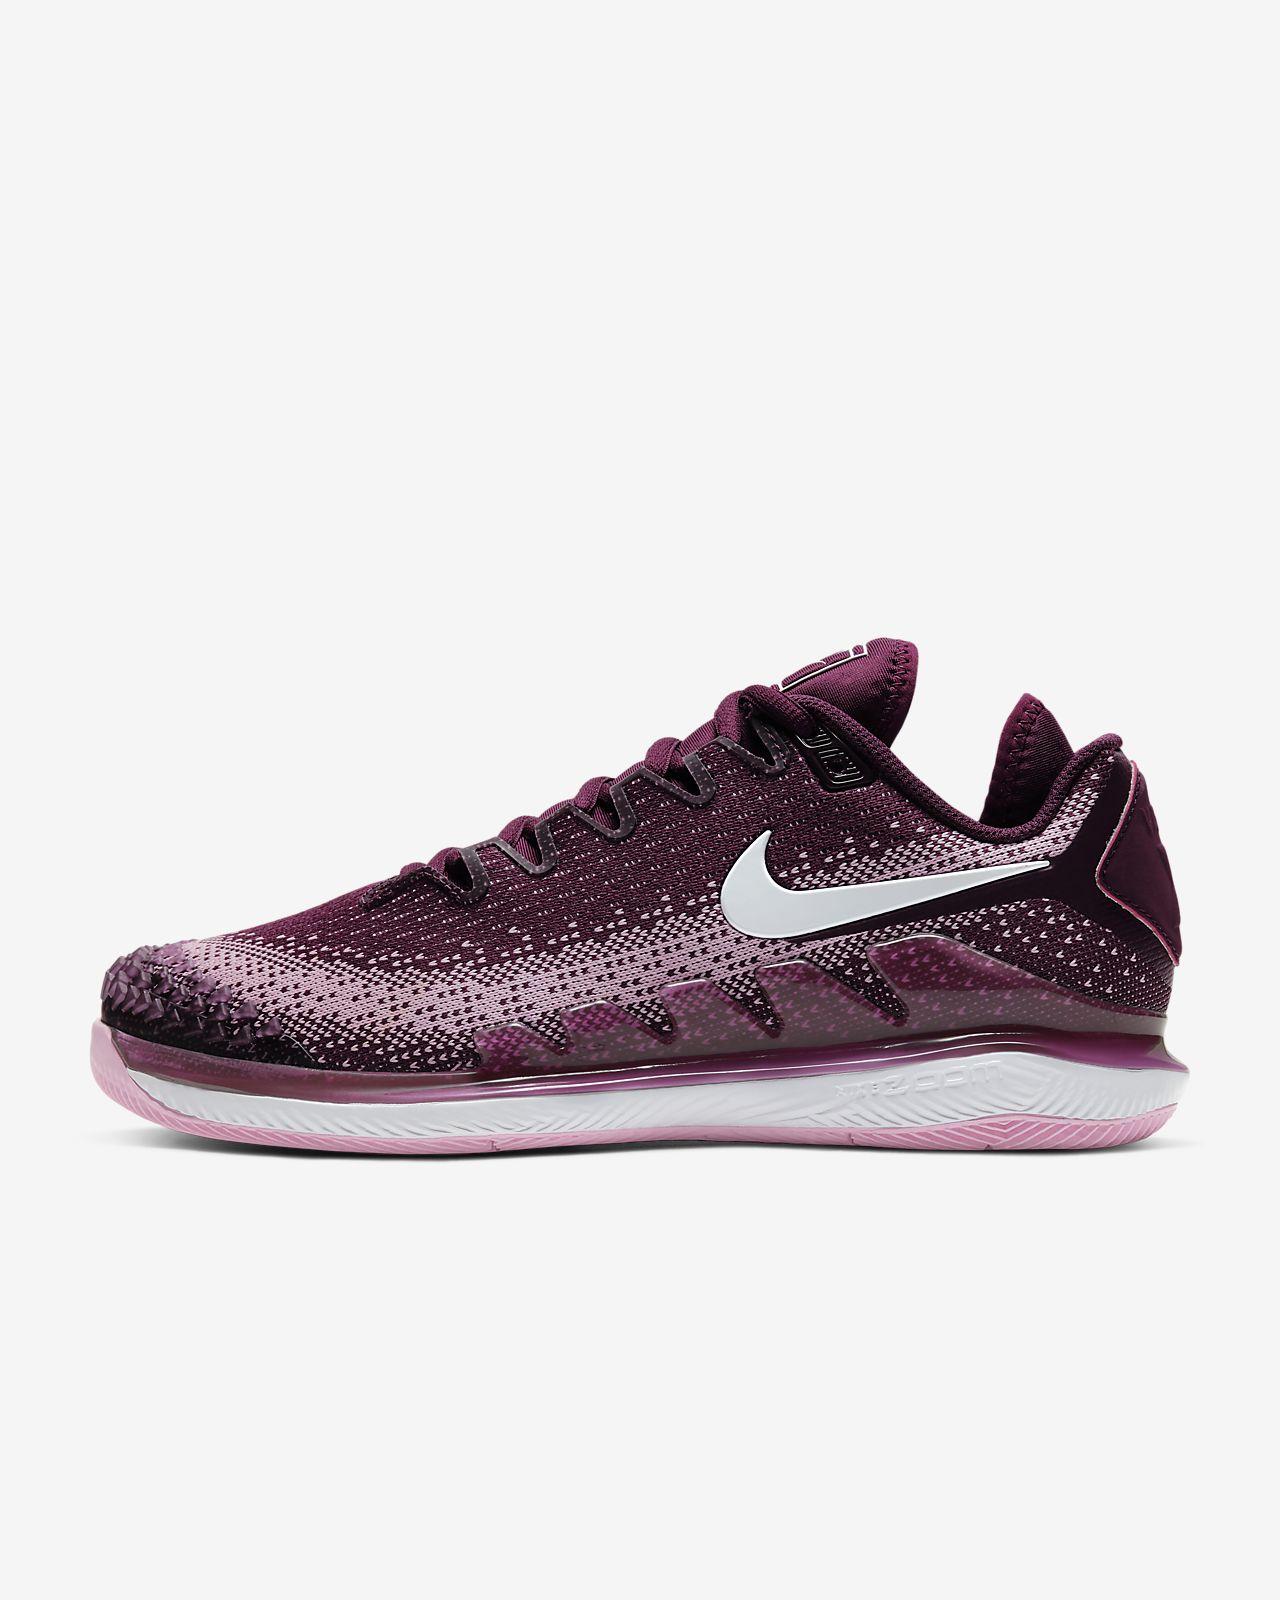 NikeCourt Air Zoom Vapor X Knit Hardcourt tennisschoen voor dames